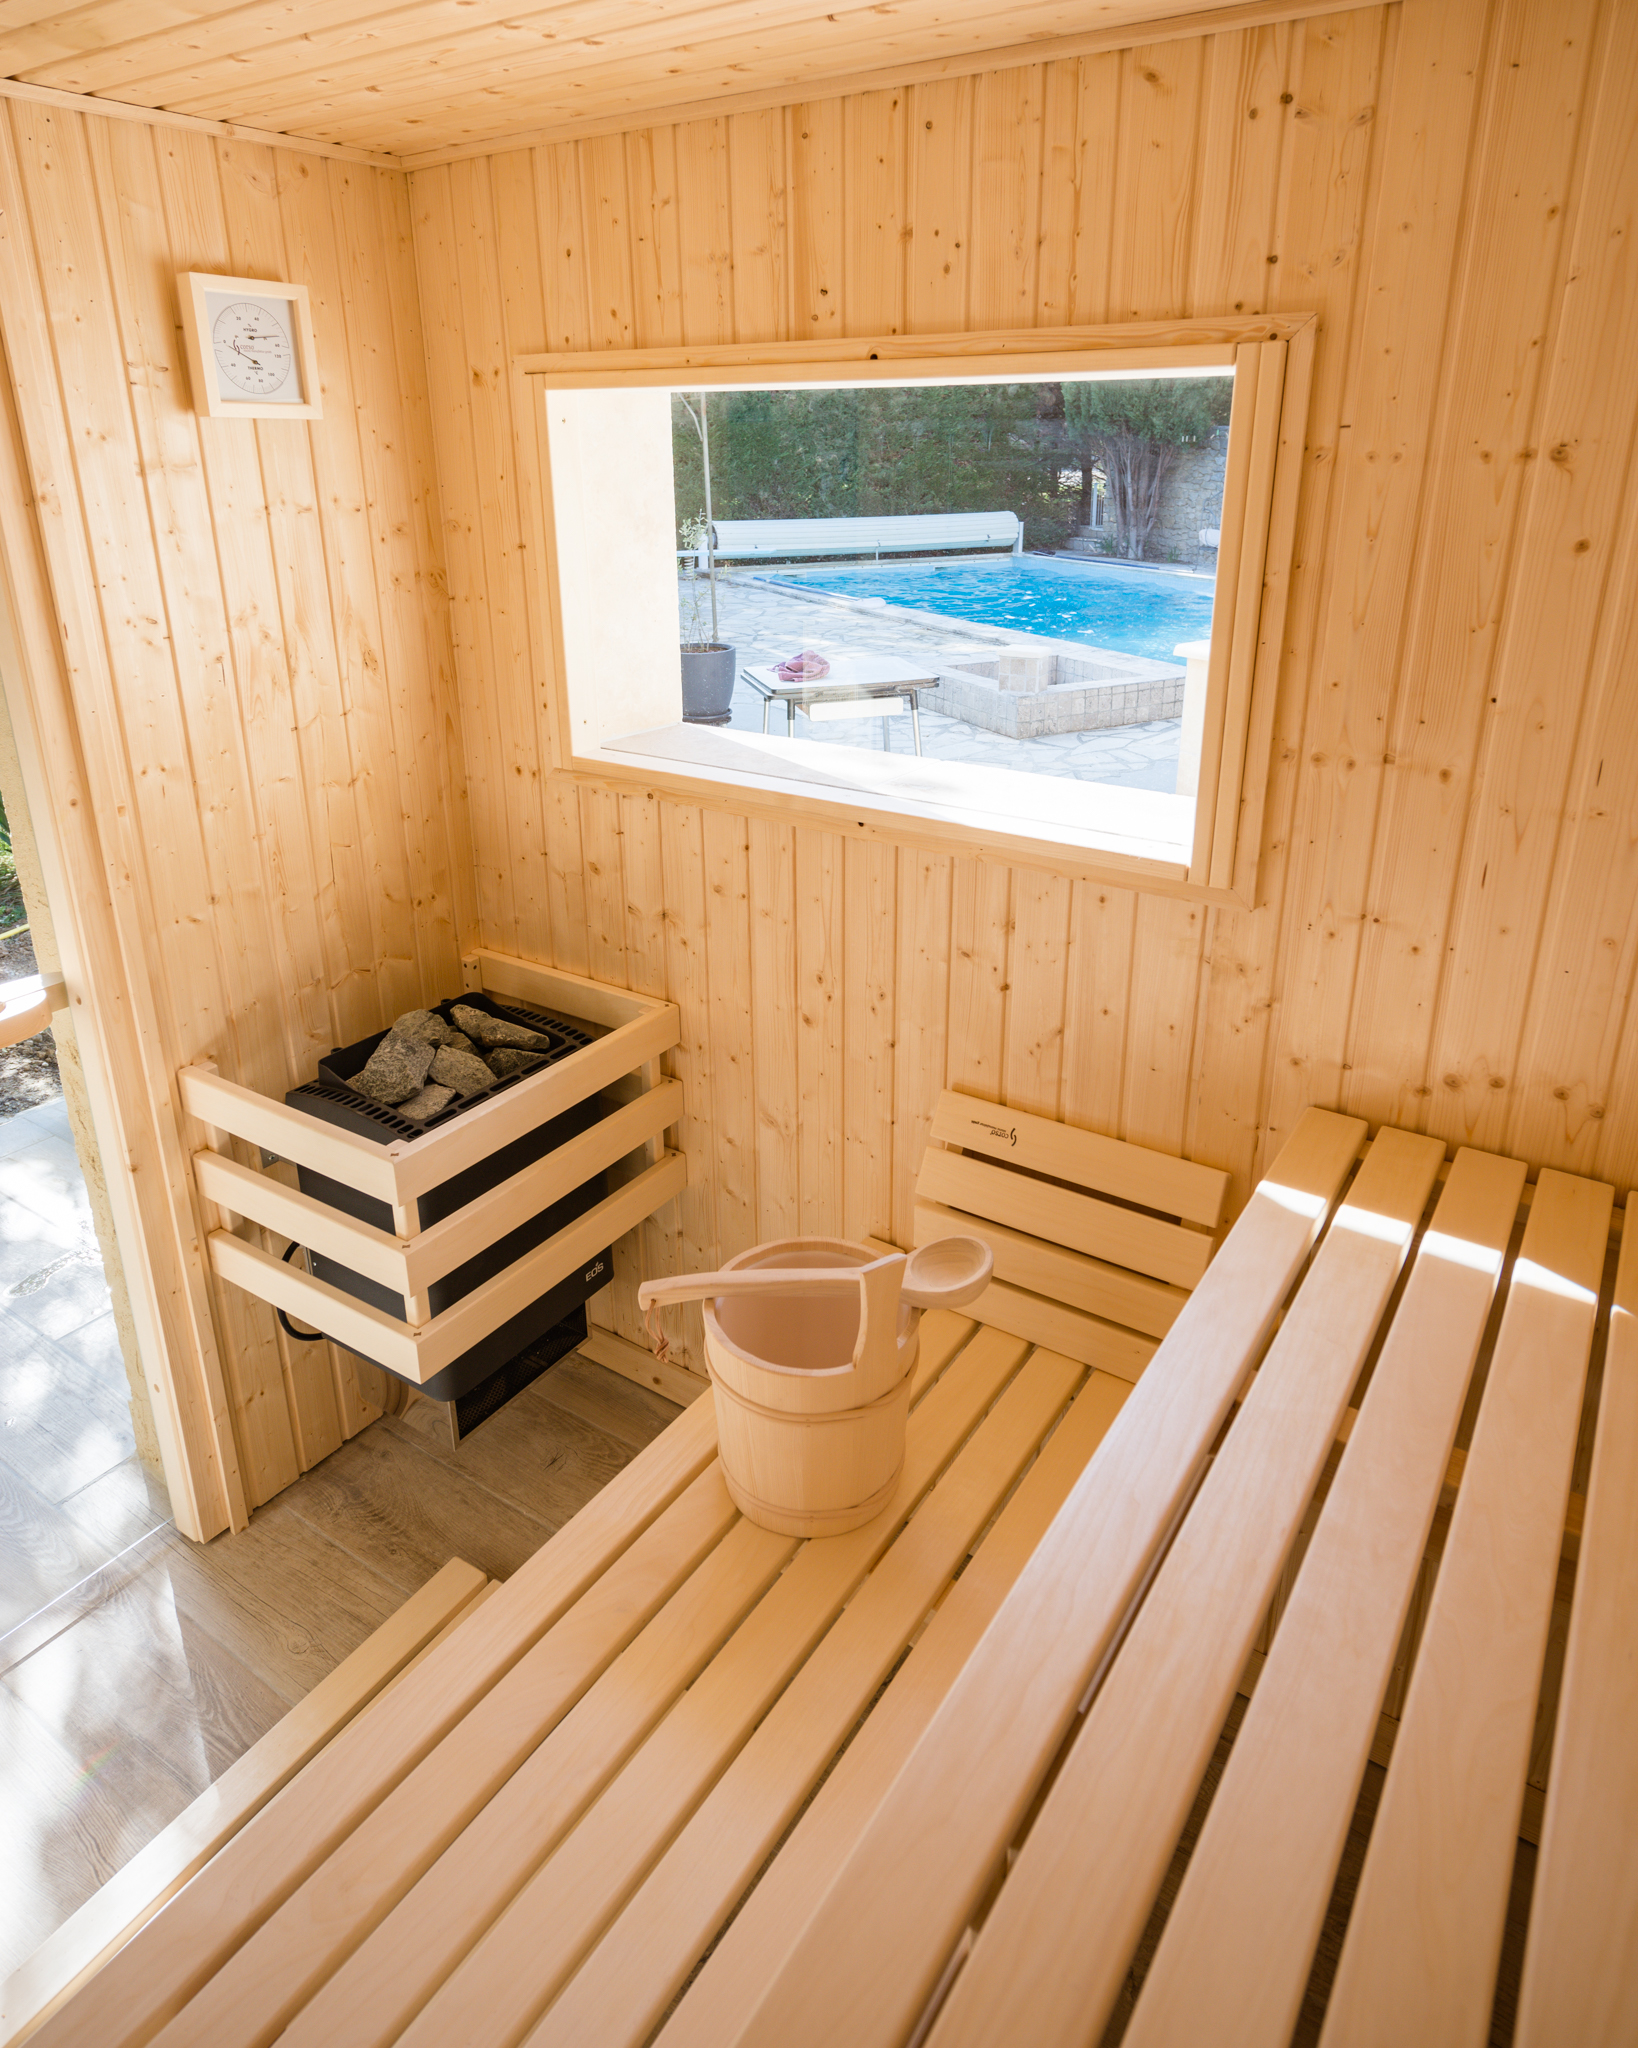 feriebolig-frankrig-sauna-pool-DSC_4651.jpg